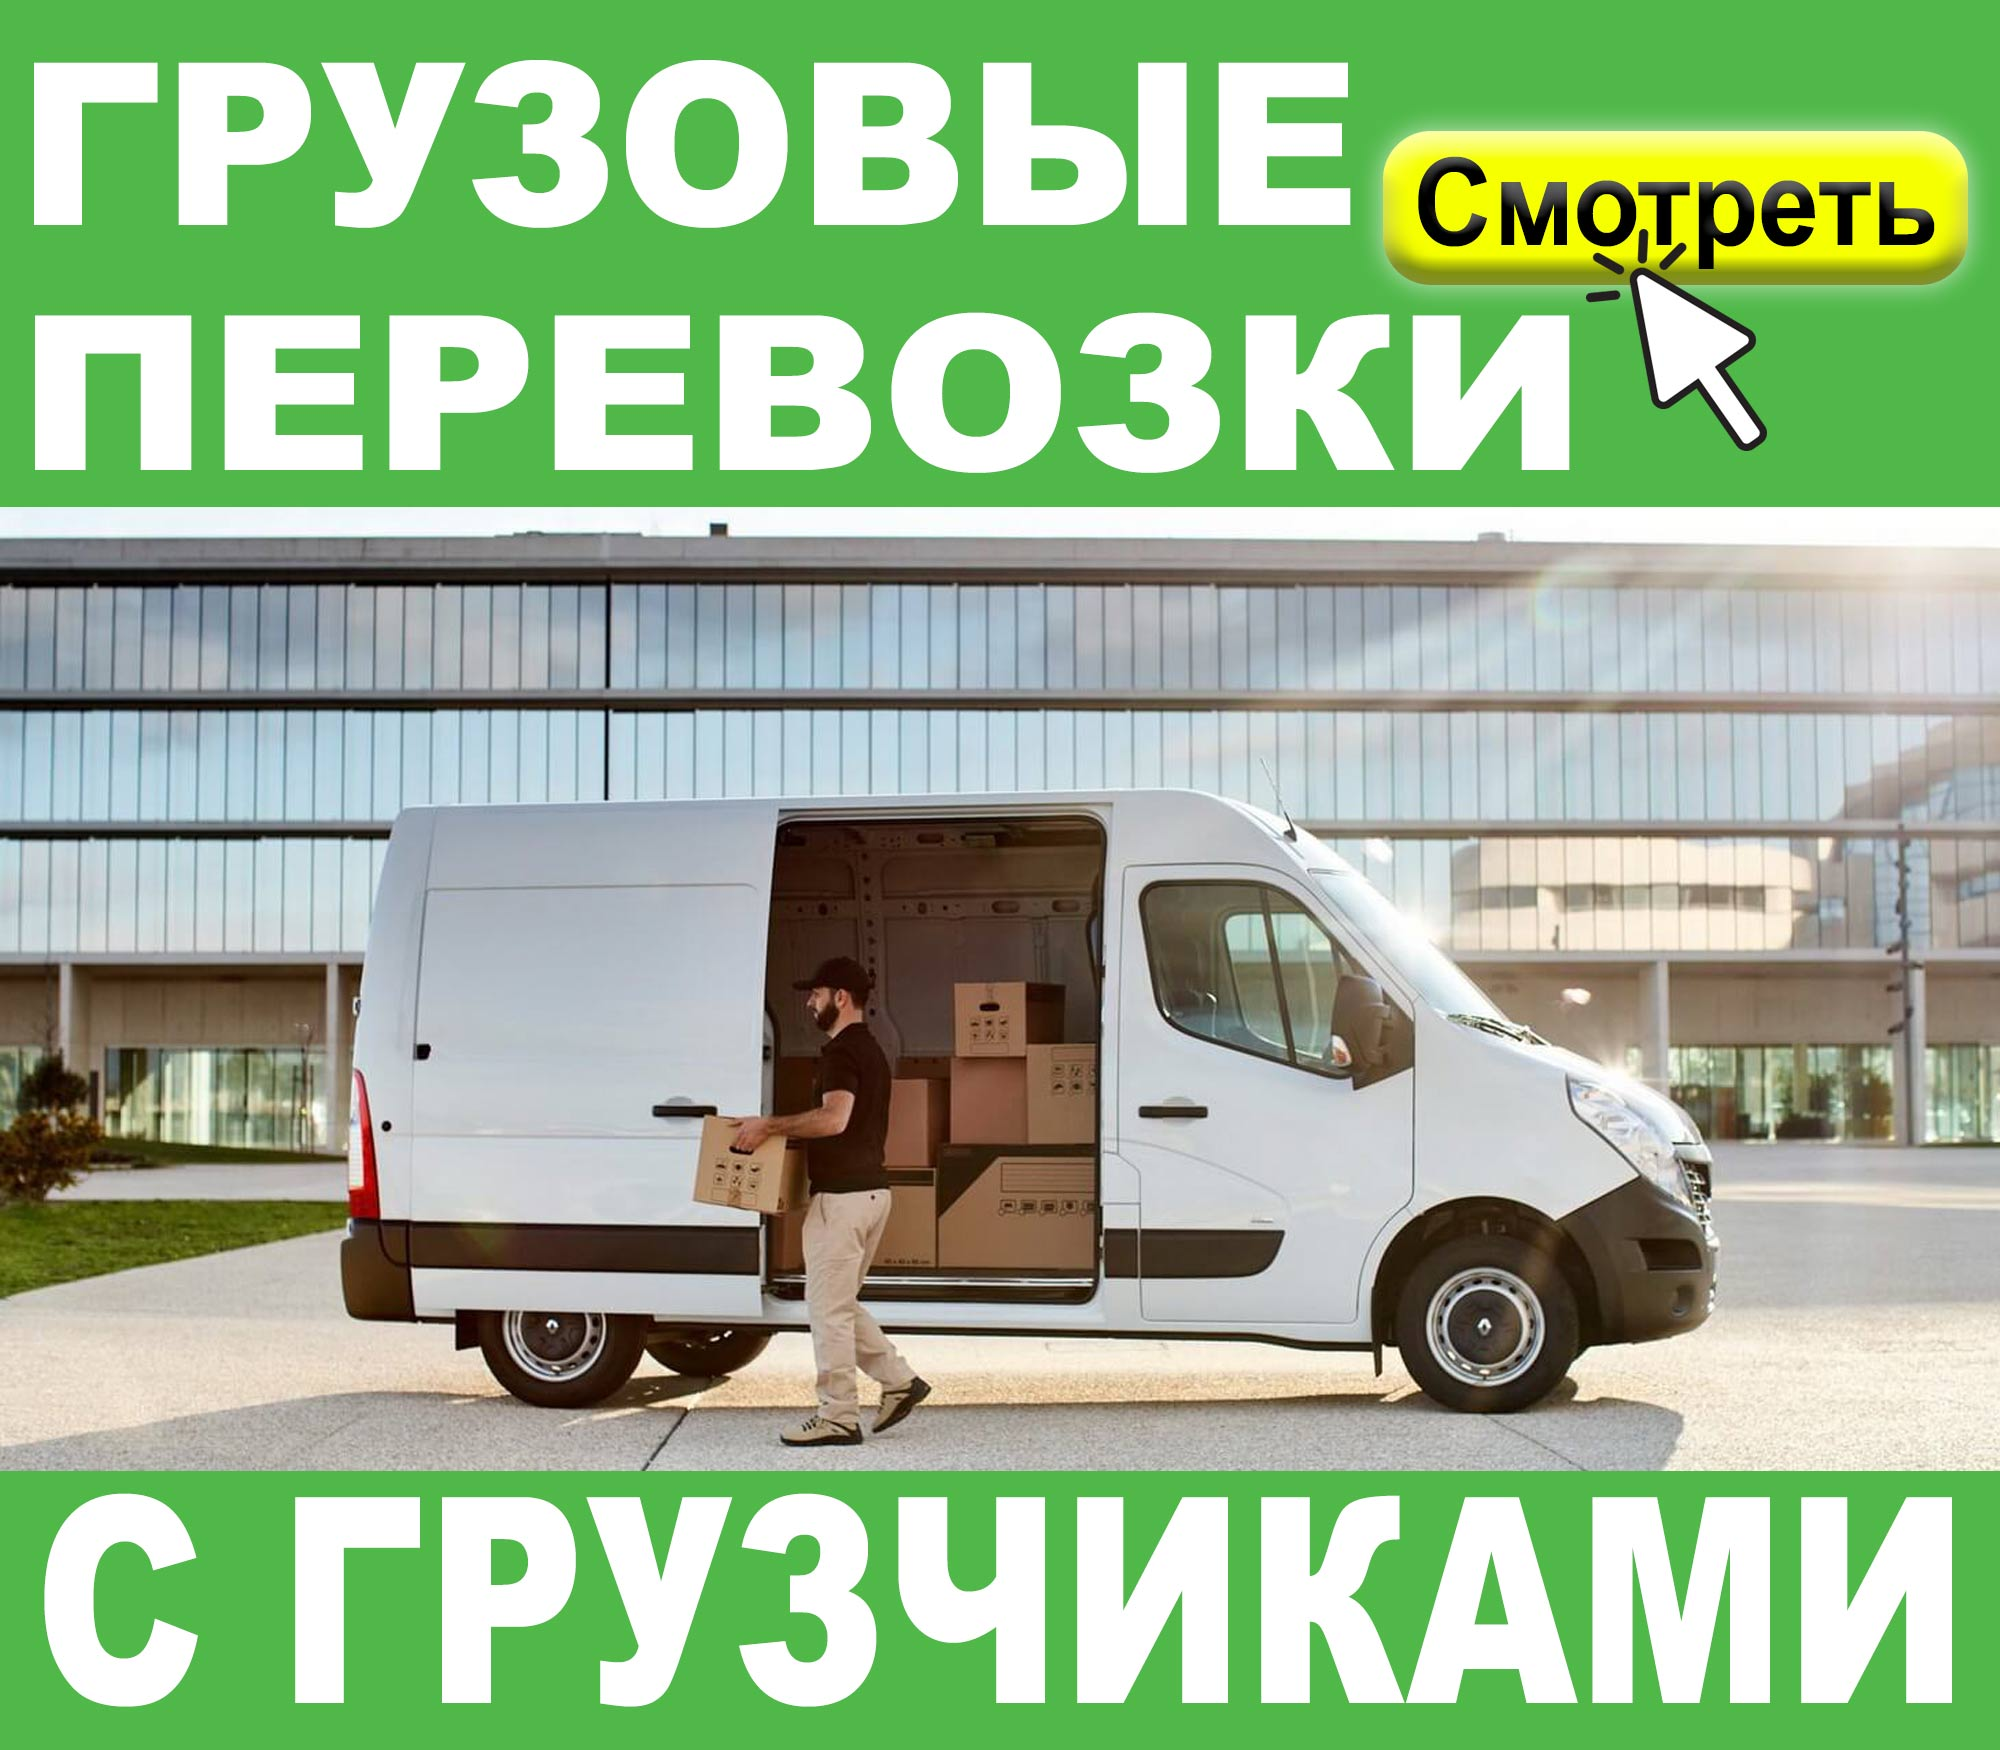 Фото Грузоперевозки/Грузовое такси по Днепру, области и Украине 7,3 грн/км 1